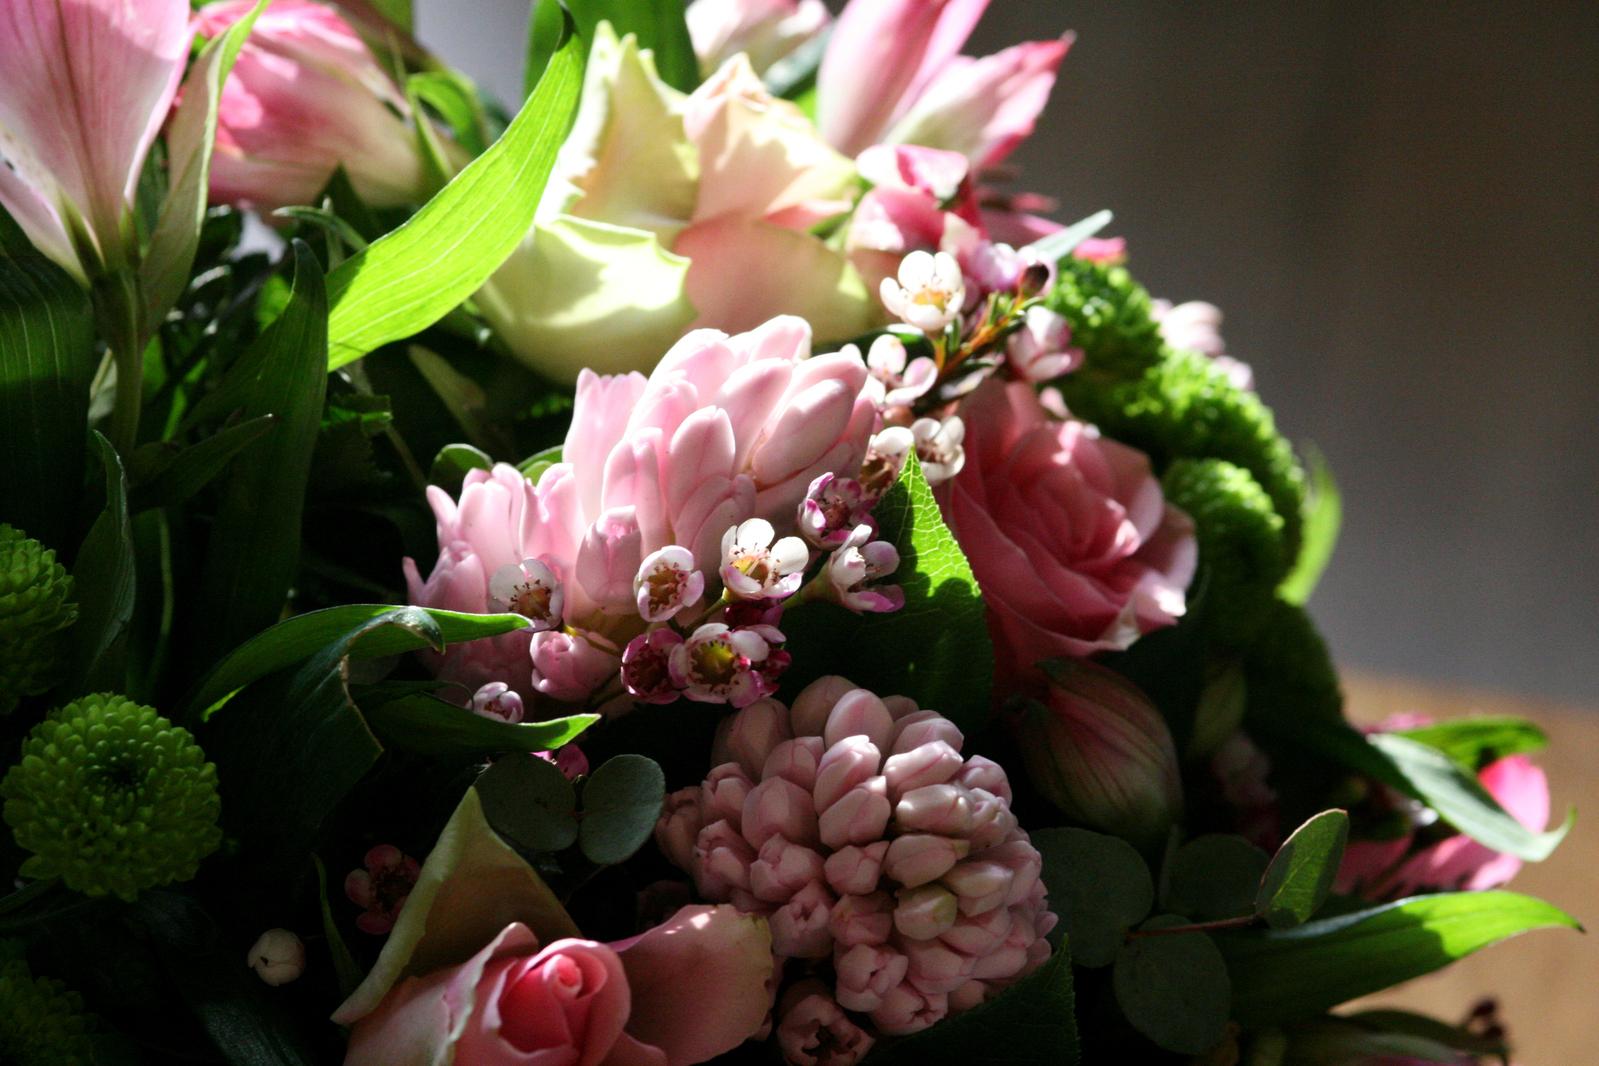 How To Make A Presentation Bouquet